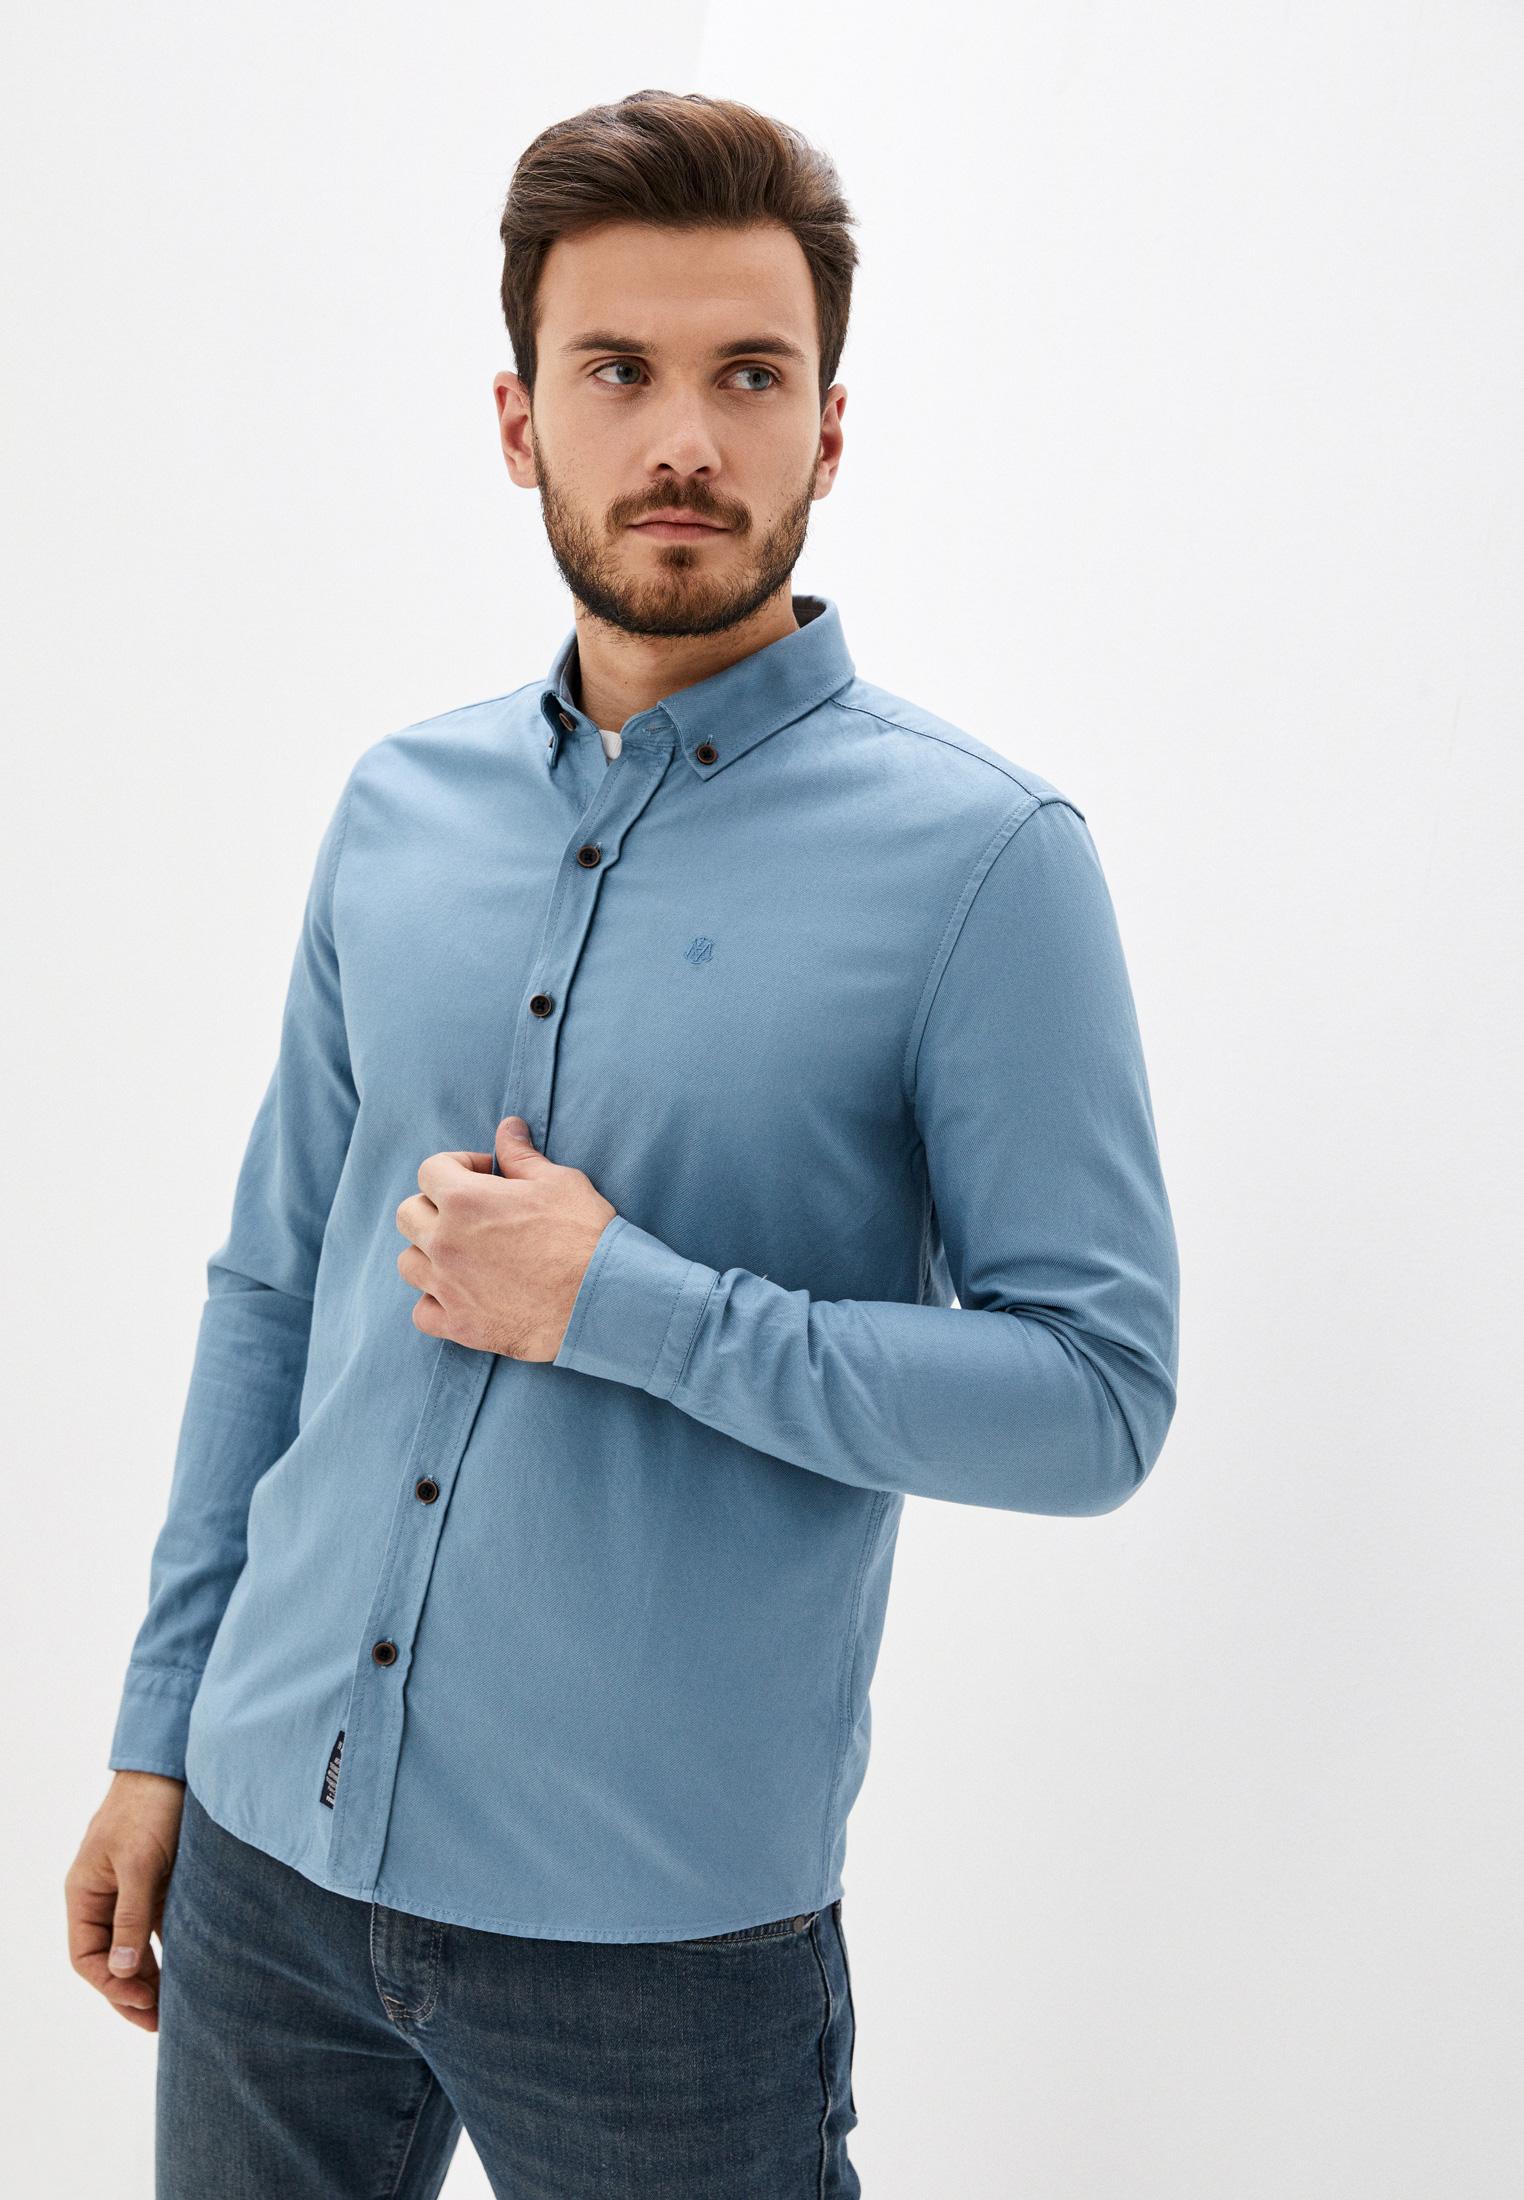 Рубашка Mavi LONG SLEEVE SHIRT за 2 599 ₽. в интернет-магазине Lamoda.ru